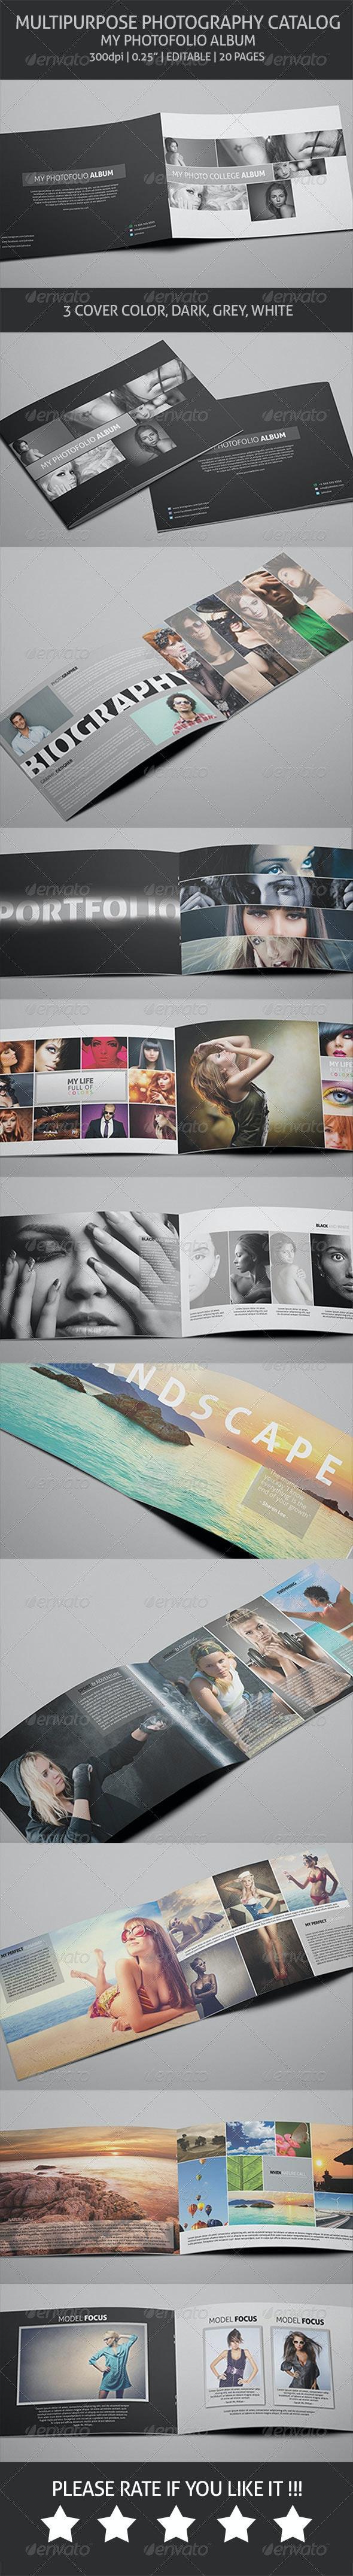 Photography Album - Multipurpose Catalog - Photo Albums Print Templates